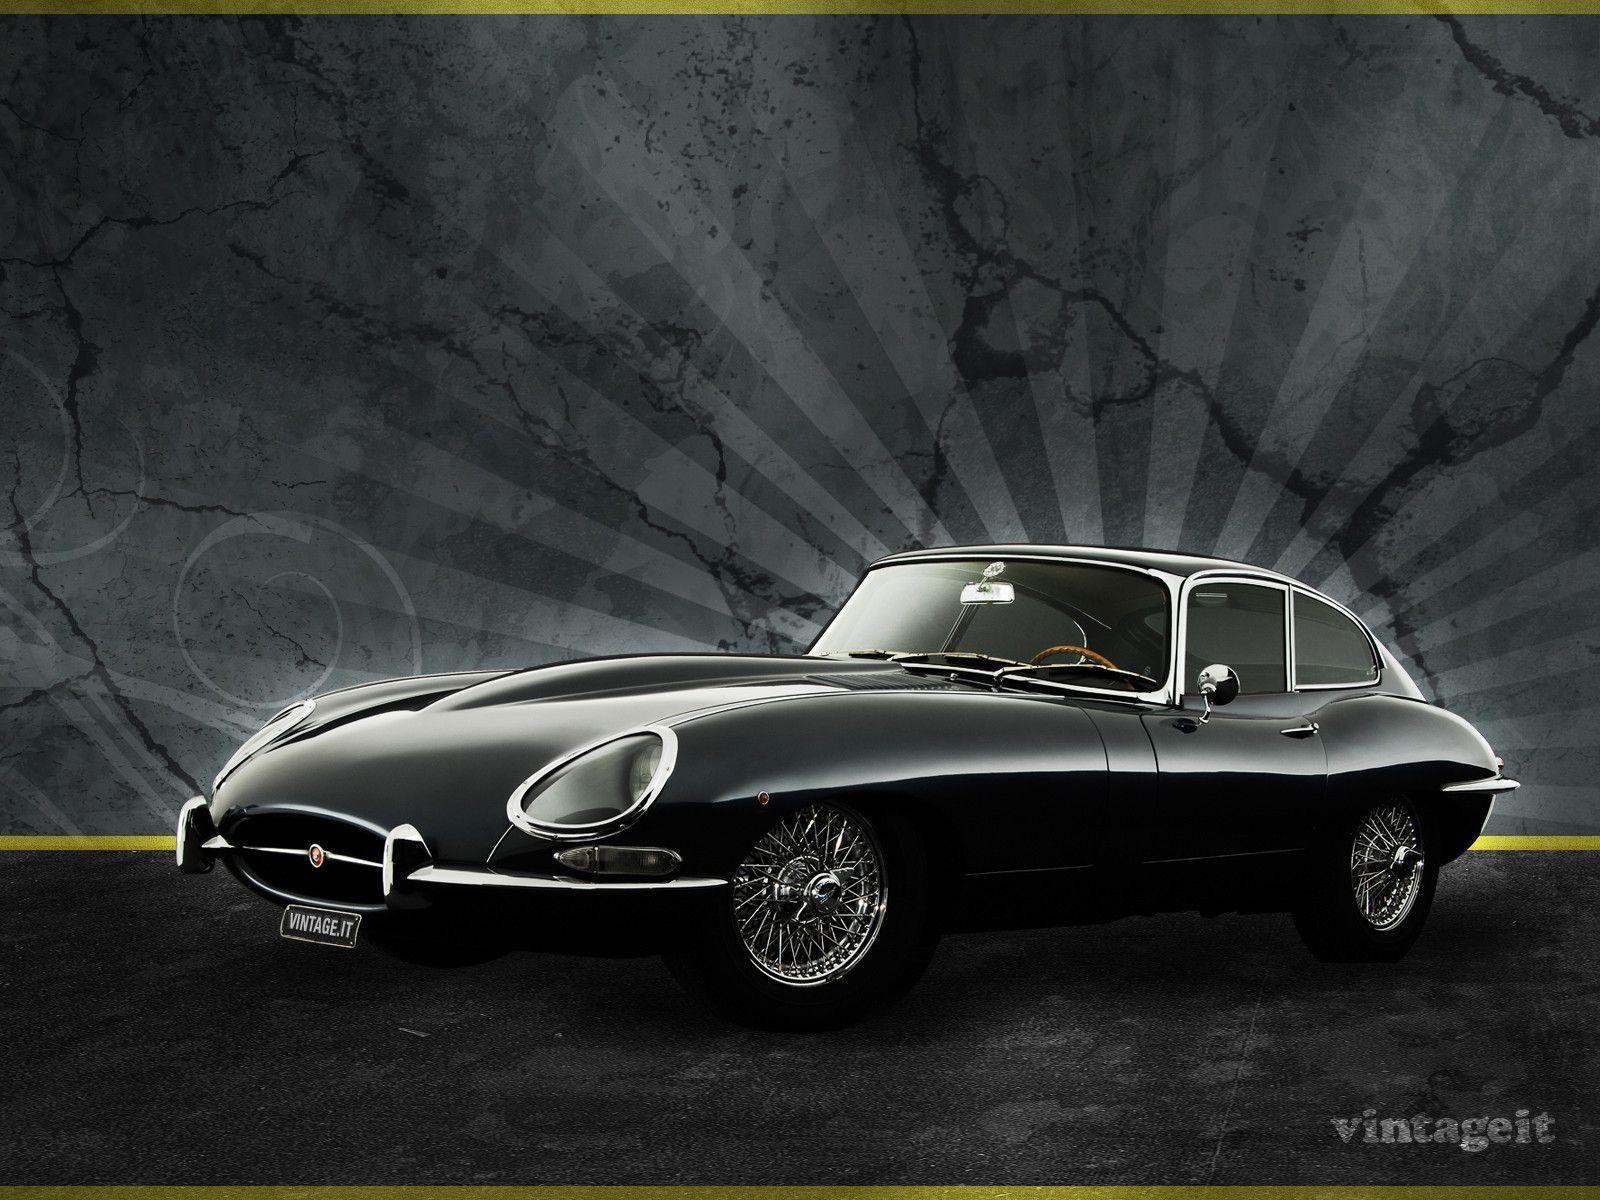 Jaguar Vintage Wallpapers Top Free Jaguar Vintage Backgrounds Wallpaperaccess